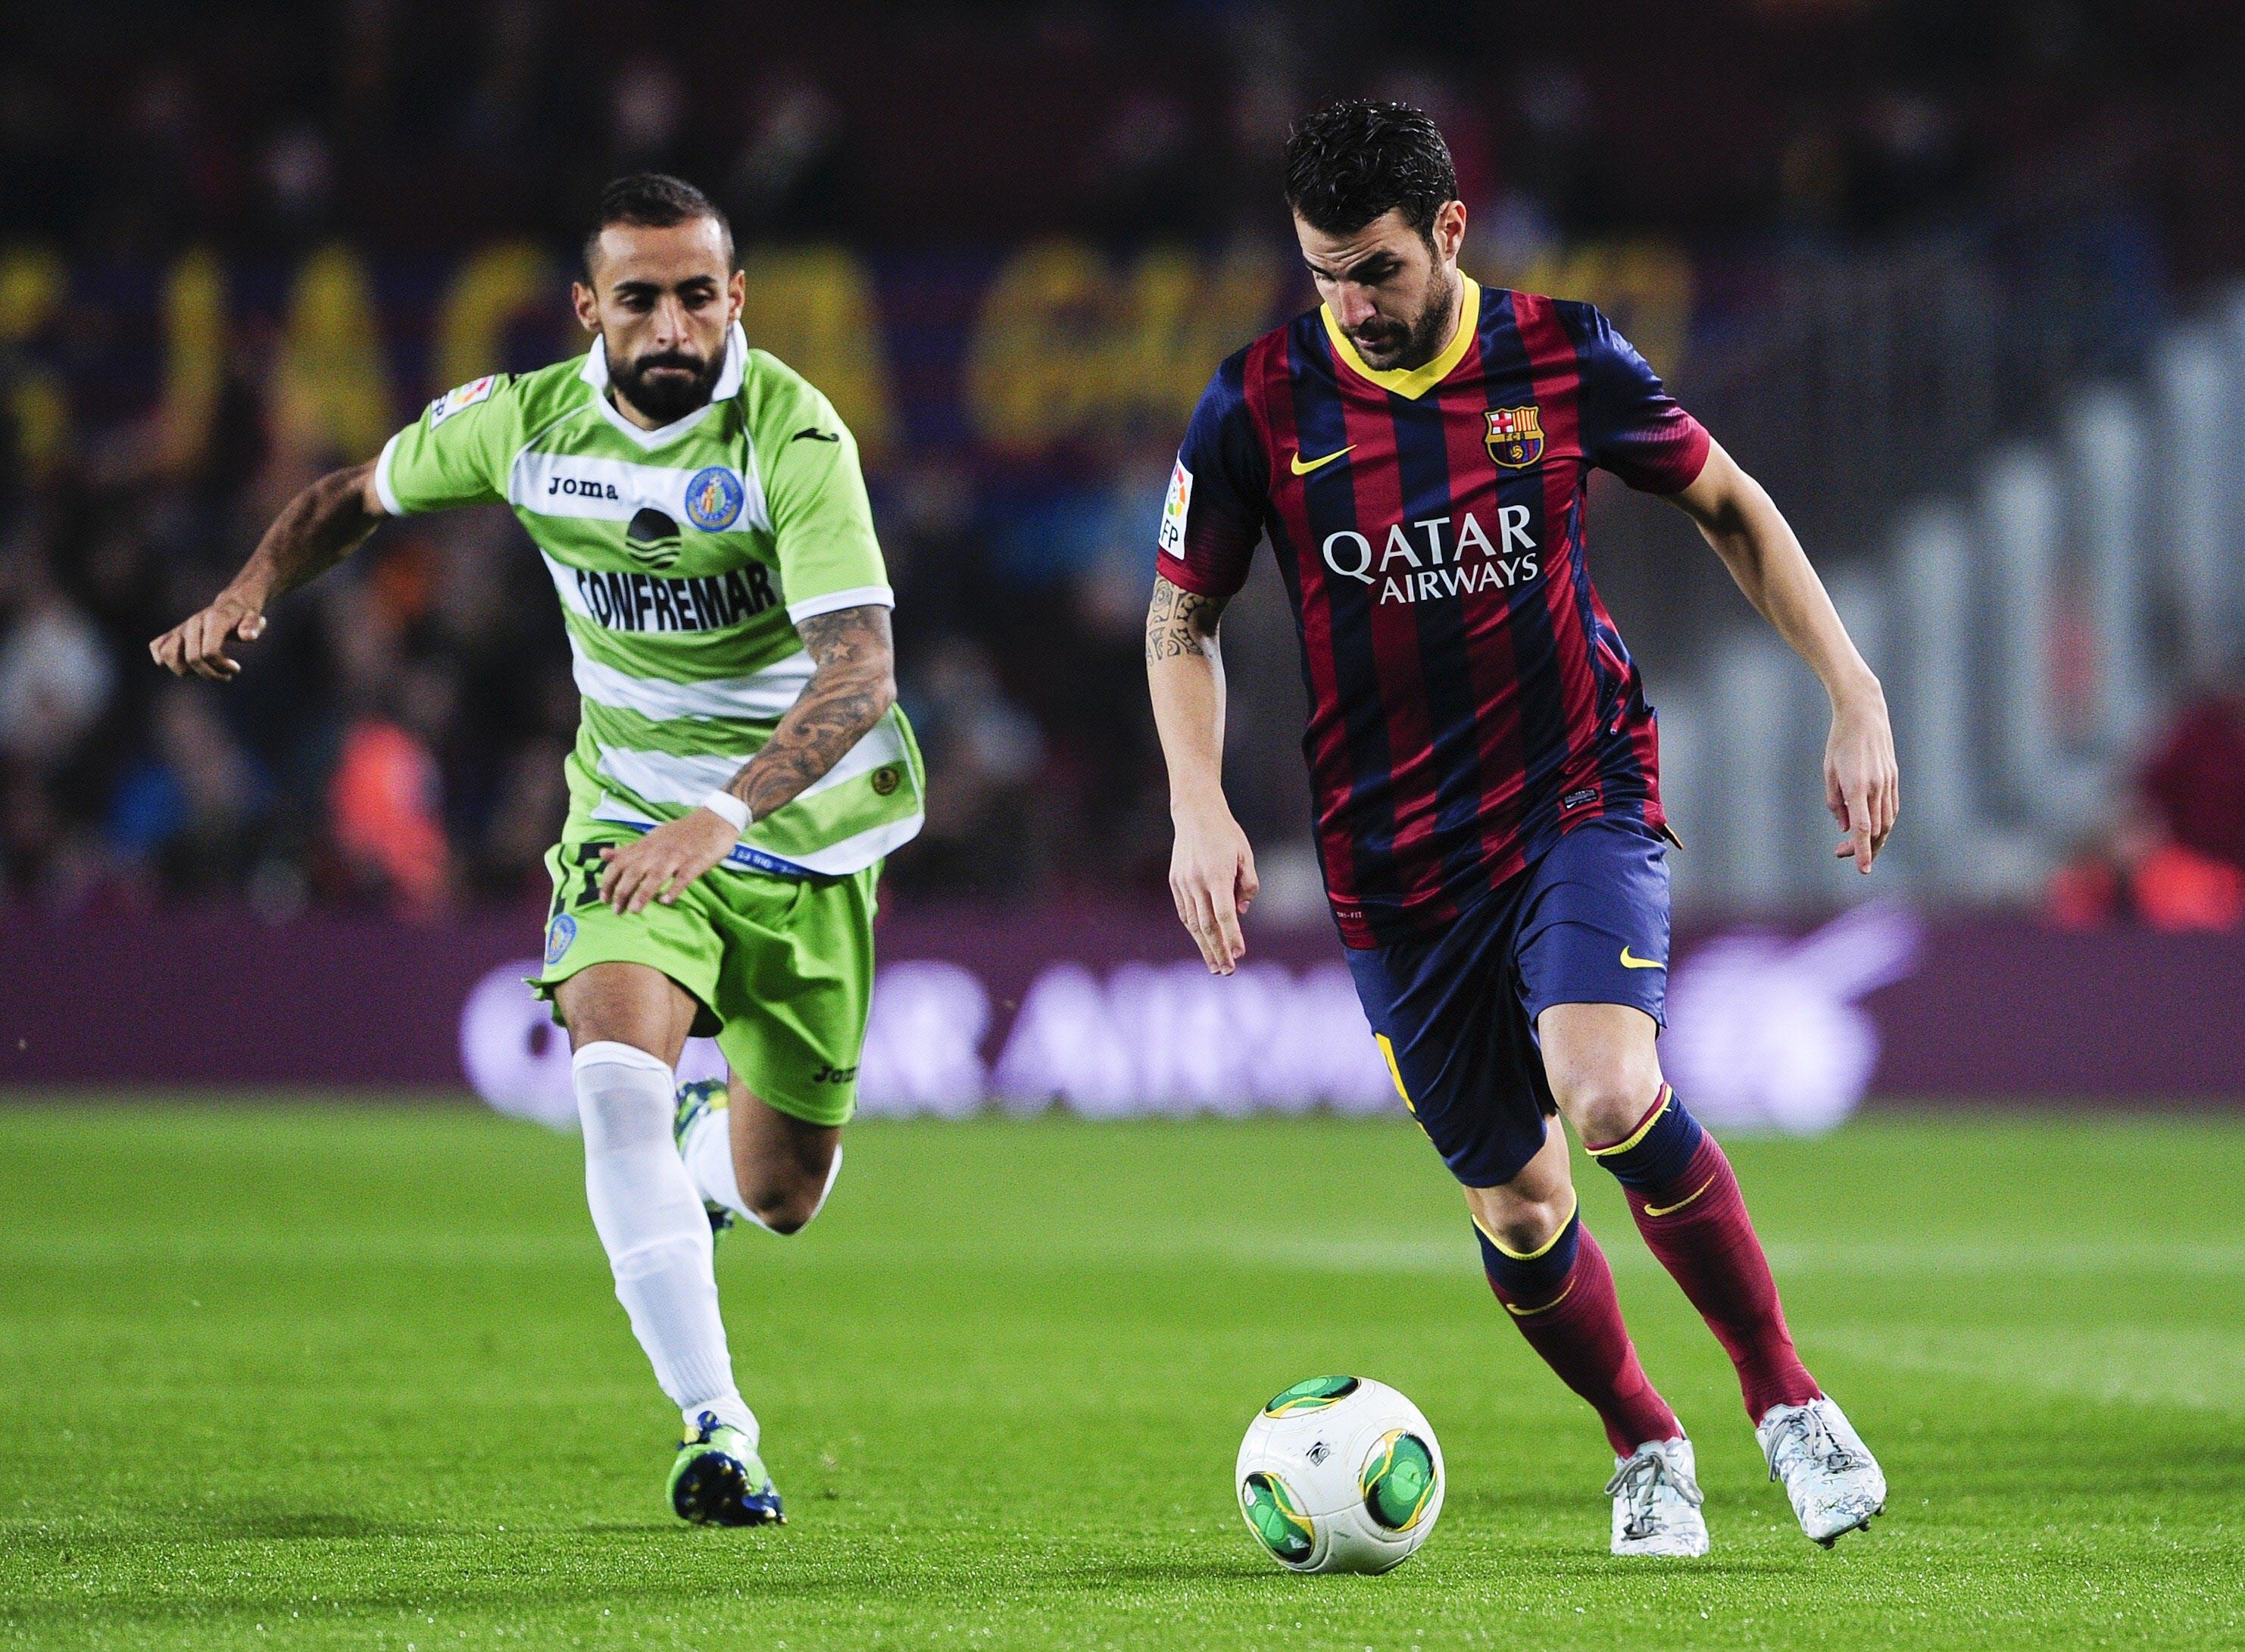 Barcelona-Getafe, ida de octavos de final